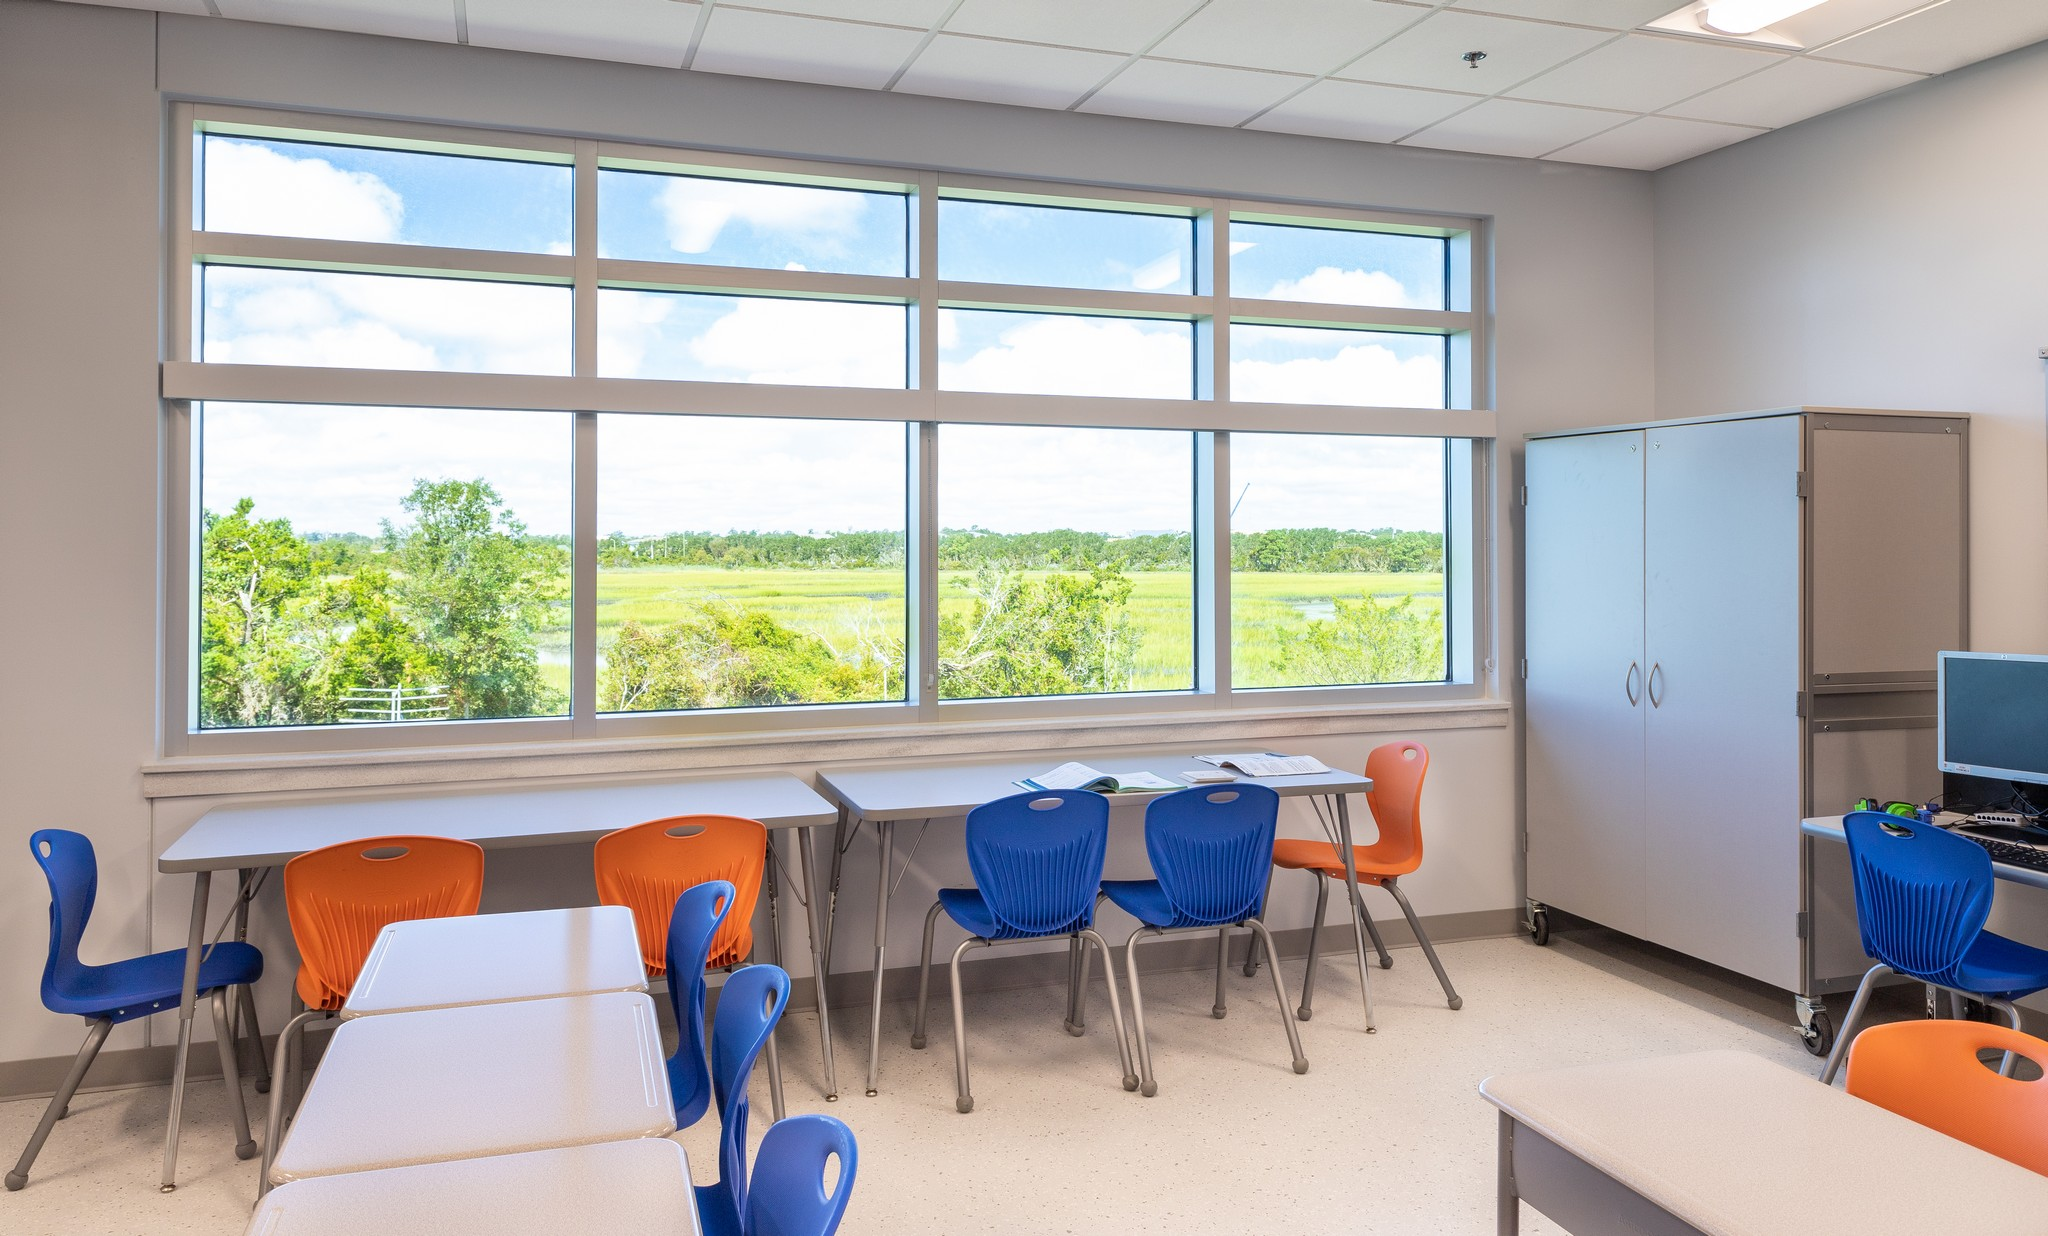 Wrightsville Beach Elementary School